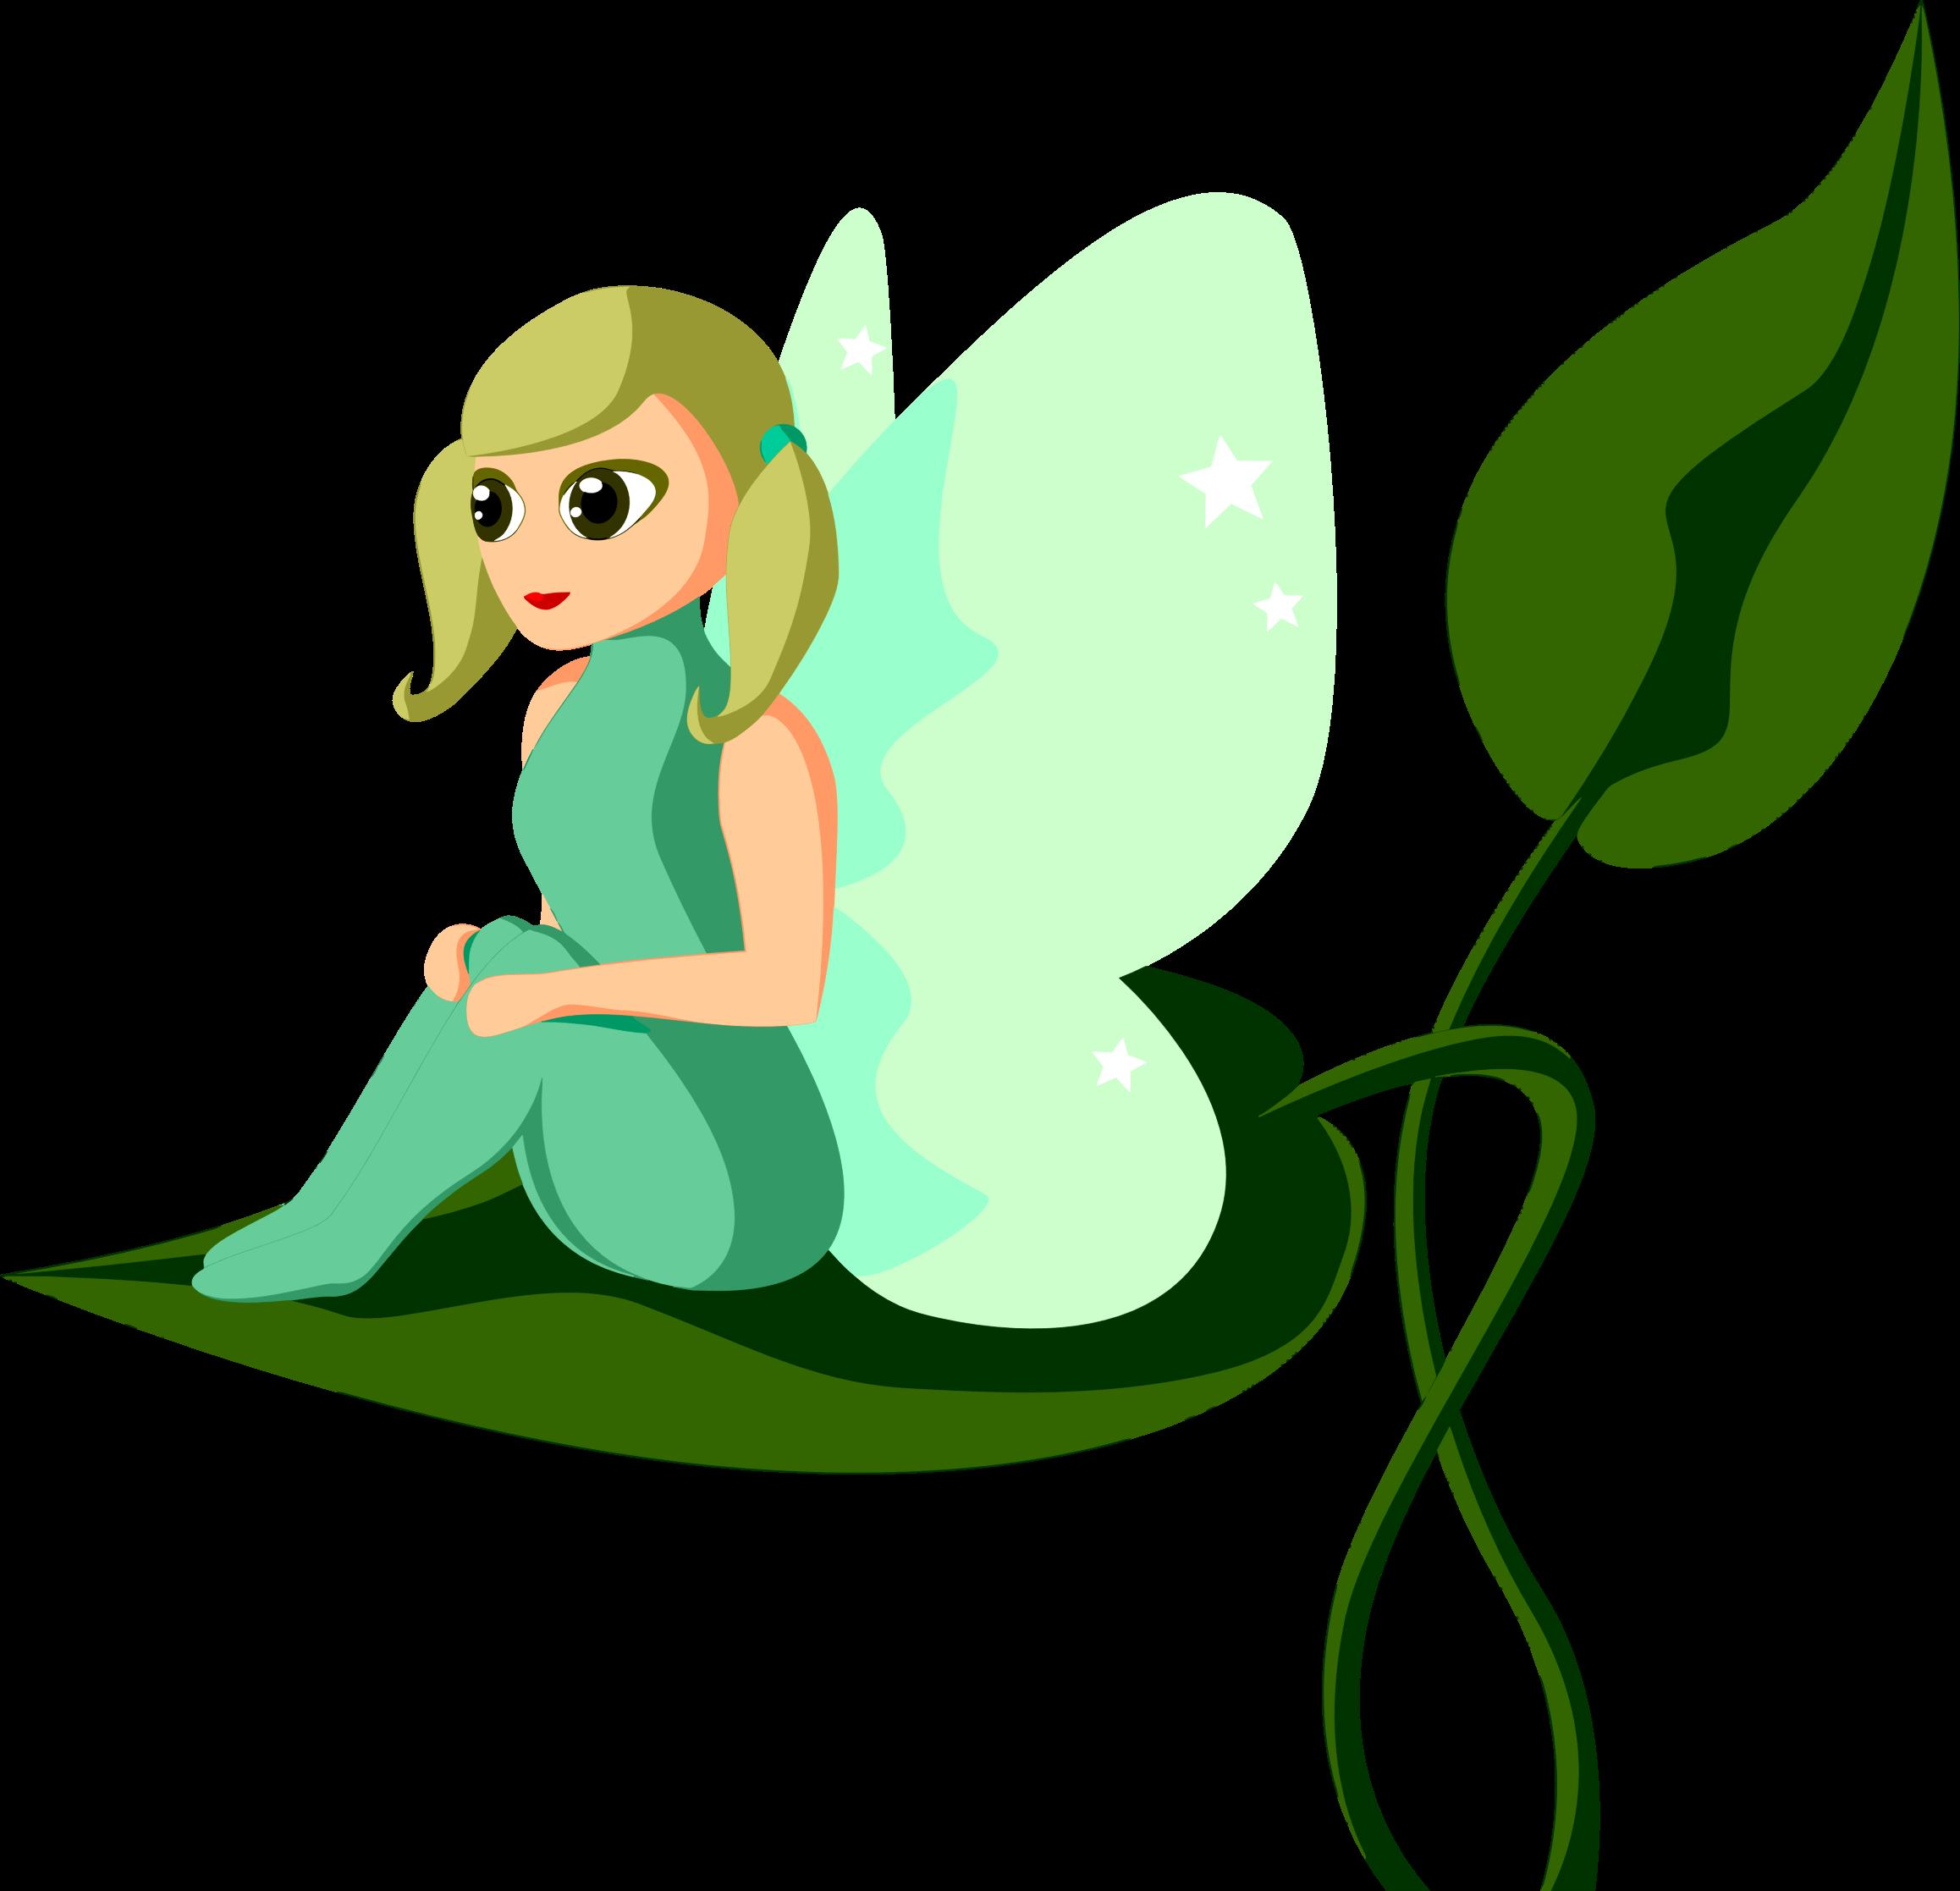 Female fairy sitting on. Fairies clipart mermaid